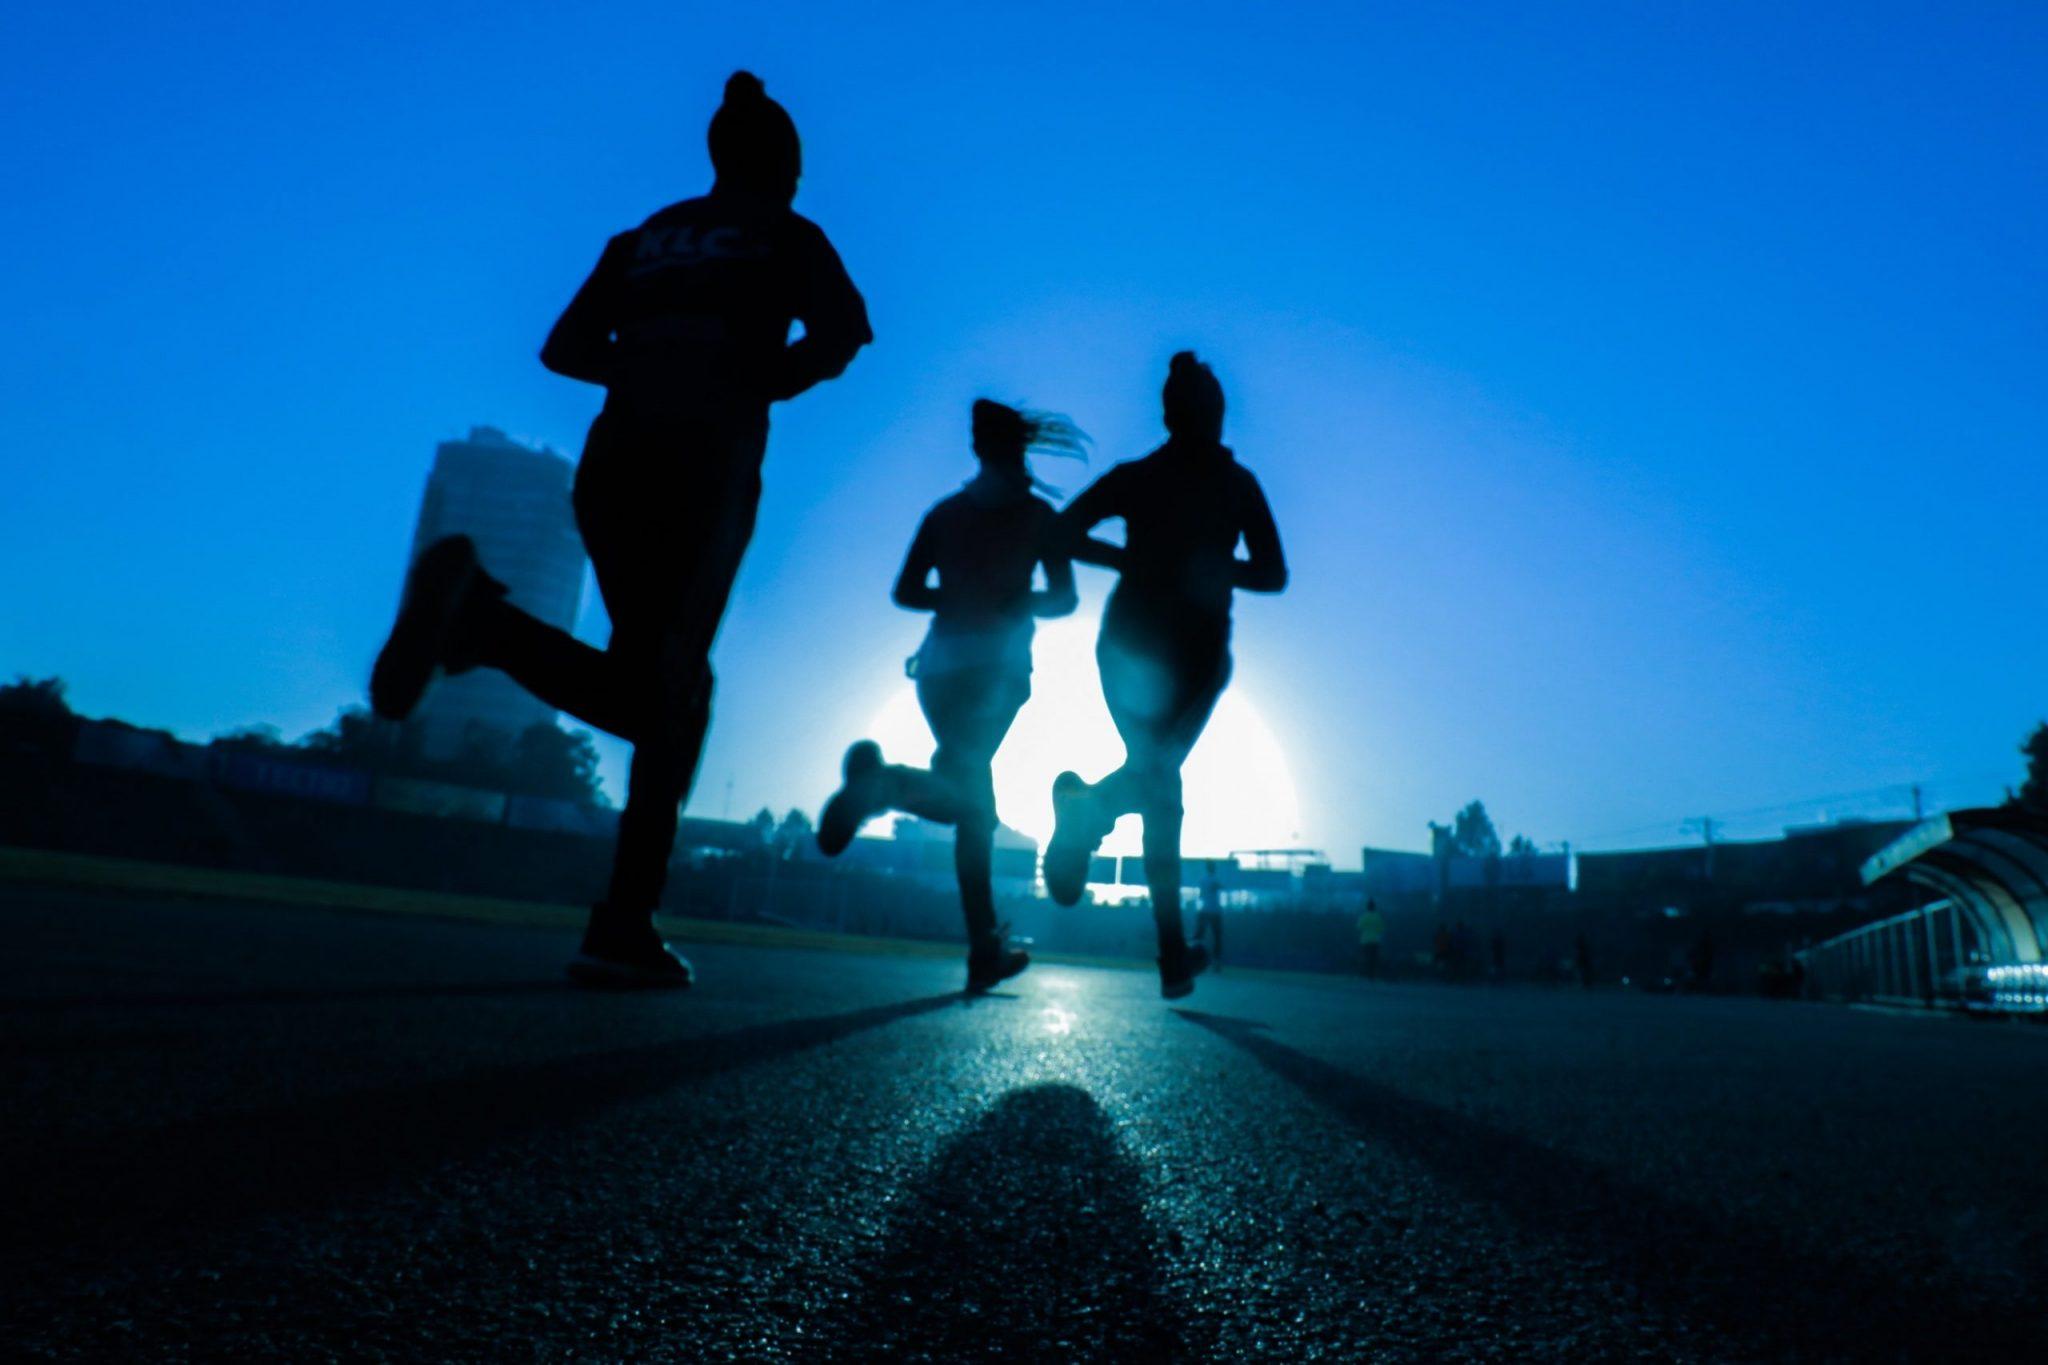 Exercise vs Learning